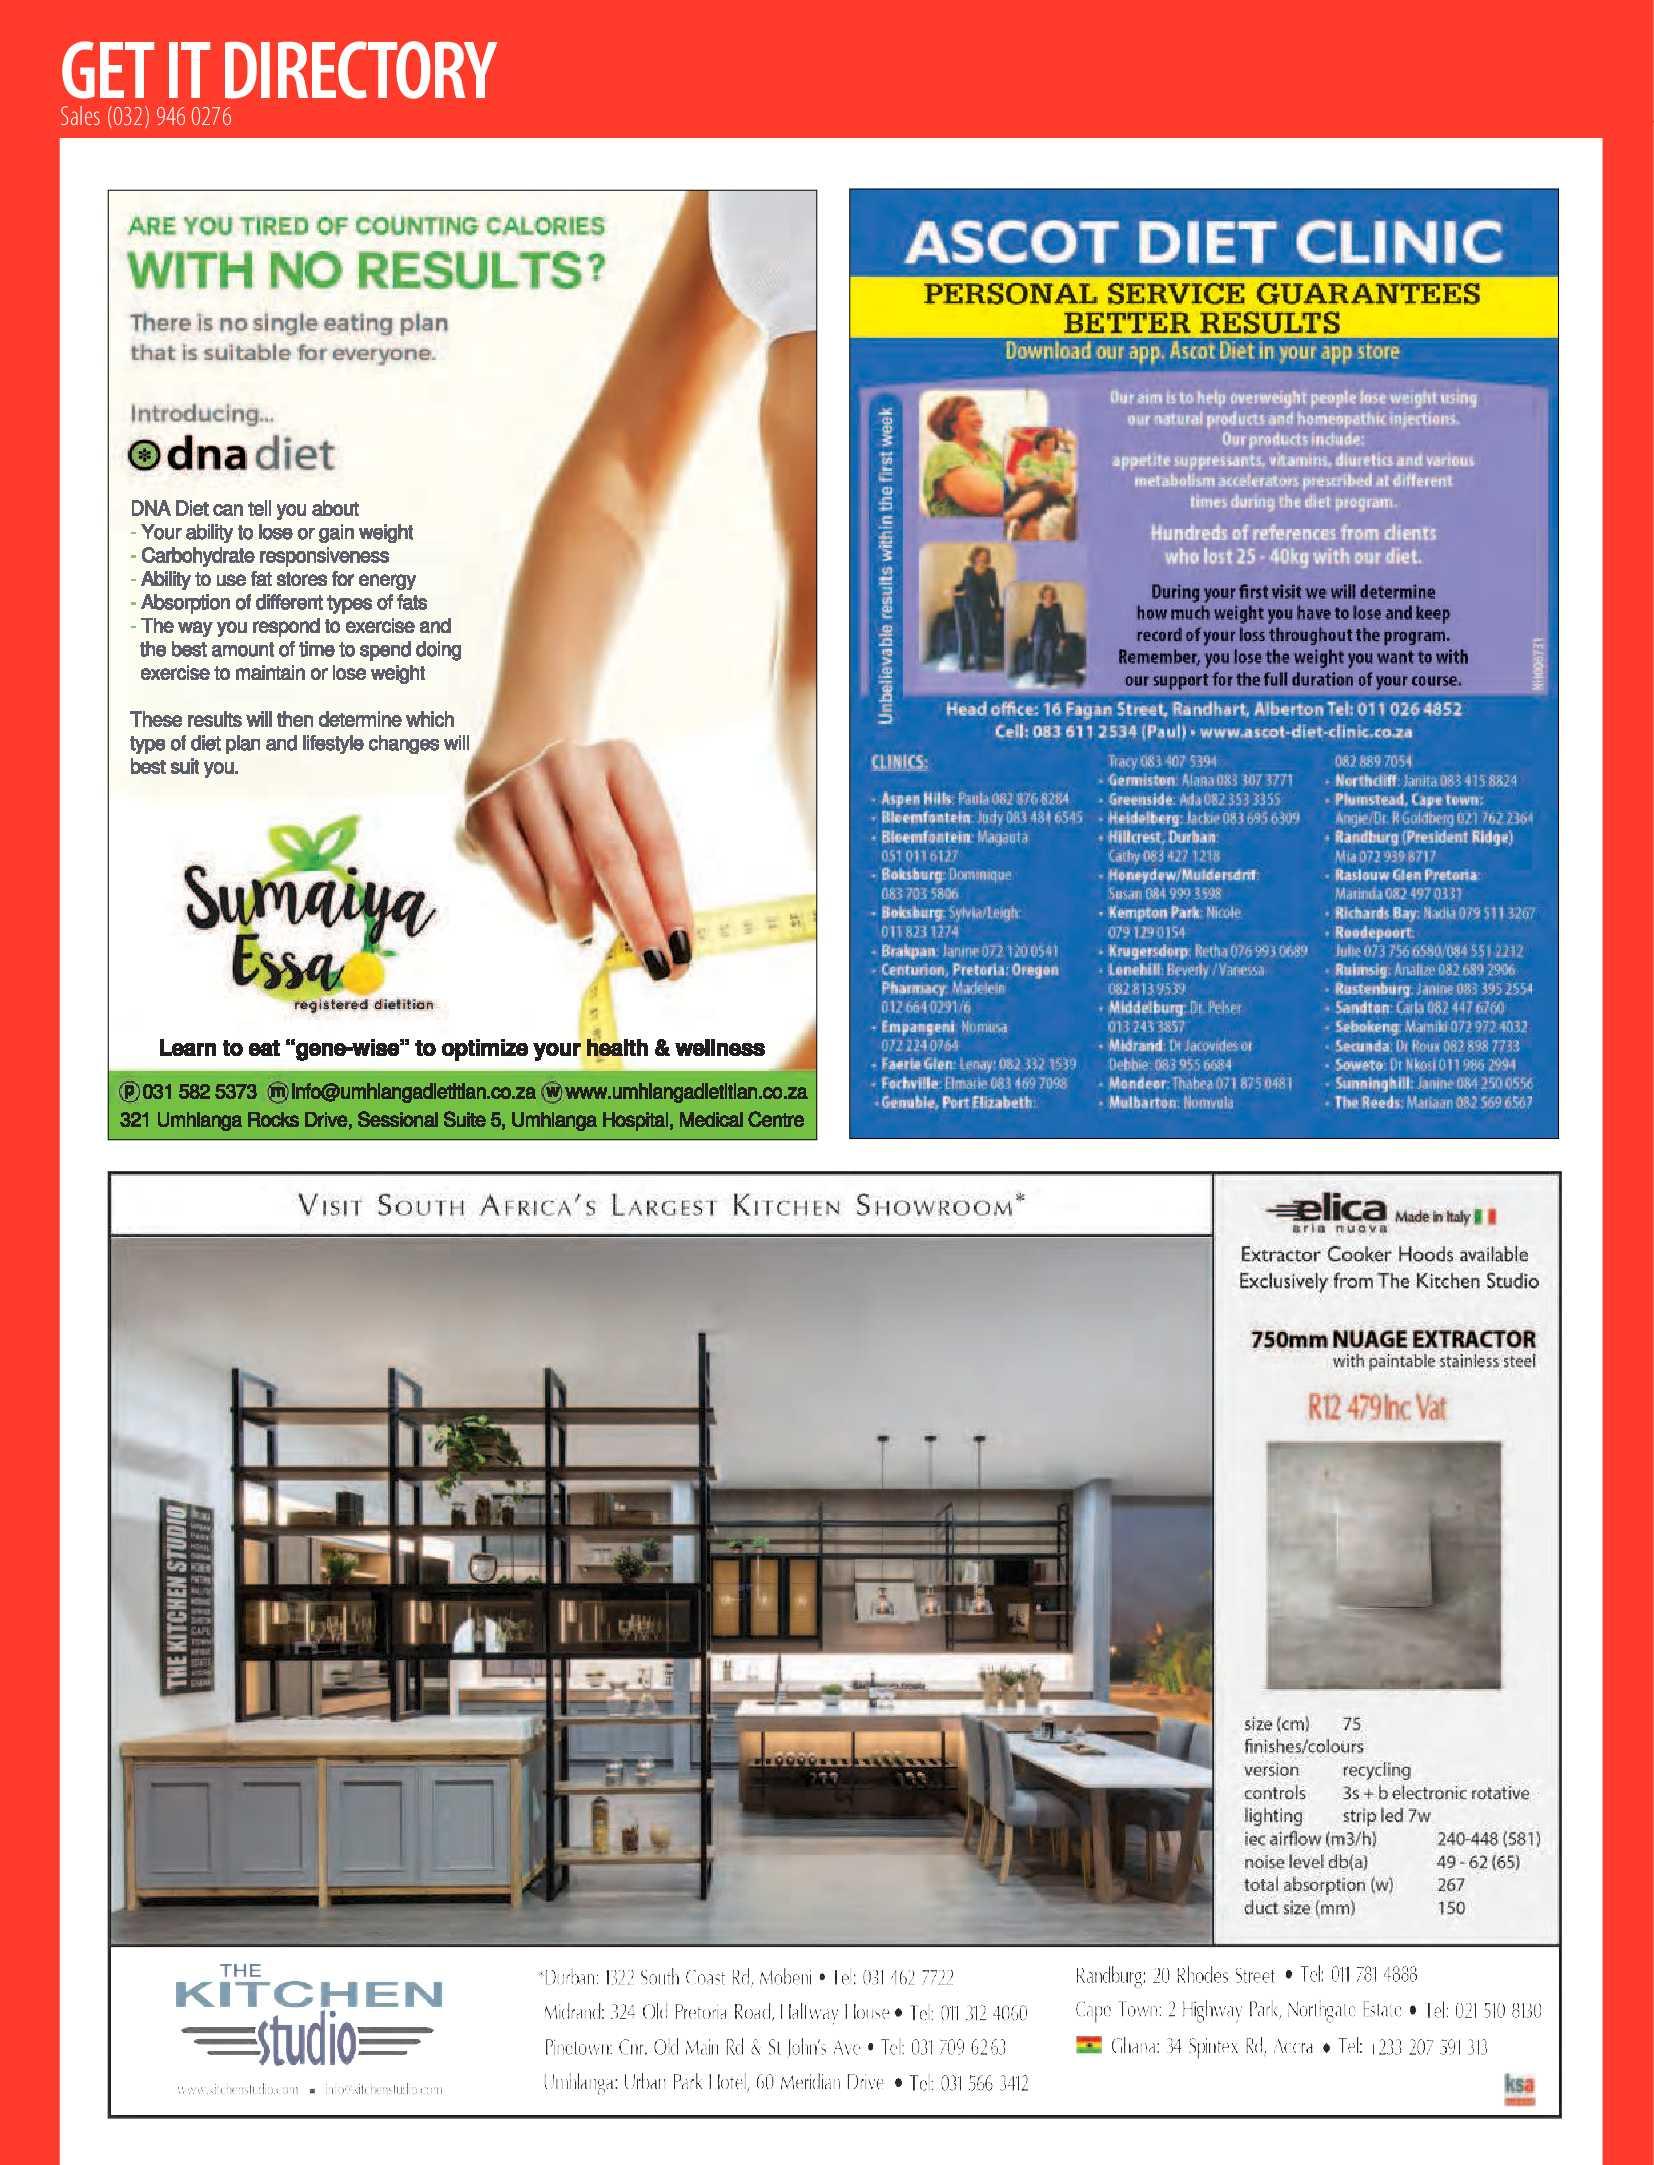 get-magazine-ballitoumhlanga-may-2017-epapers-page-56